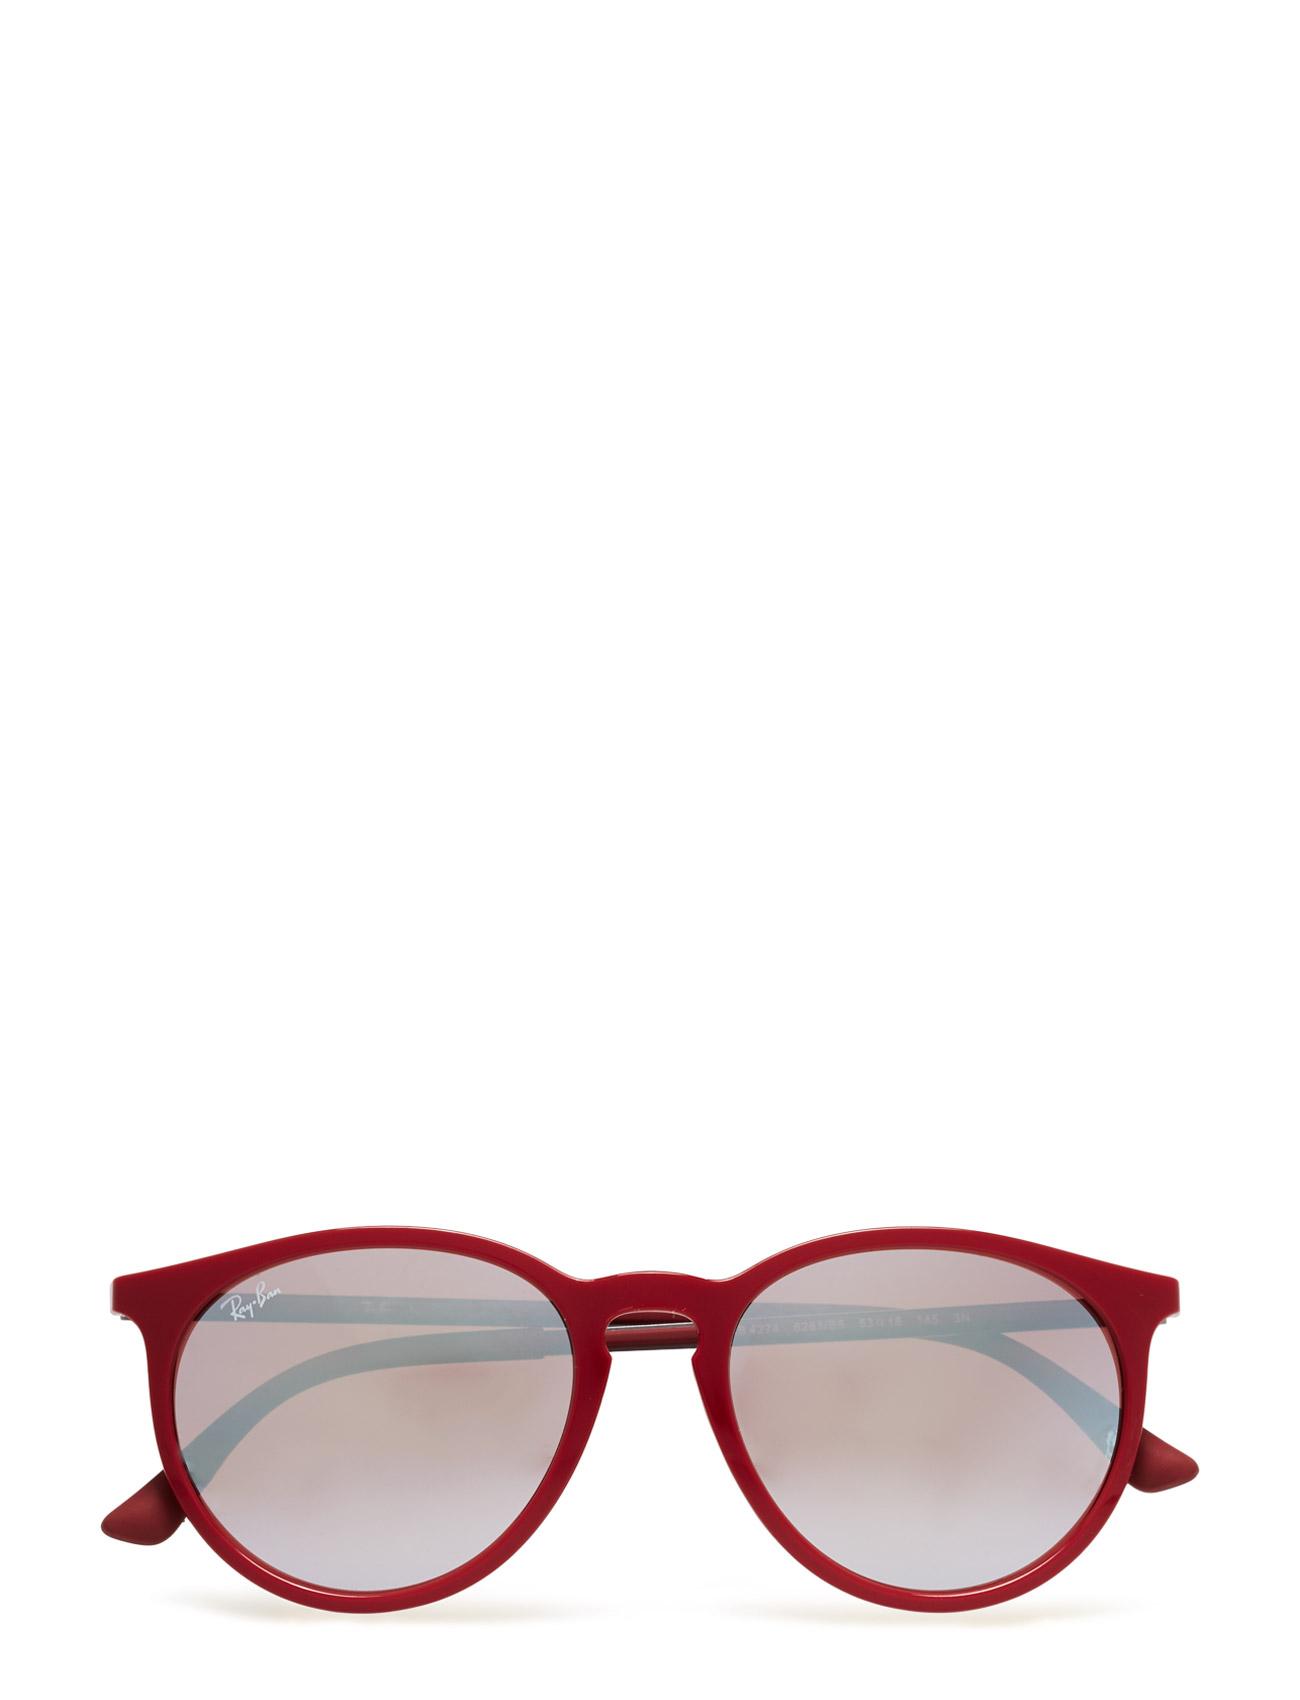 Round Frame Ray-Ban Solbriller til Damer i